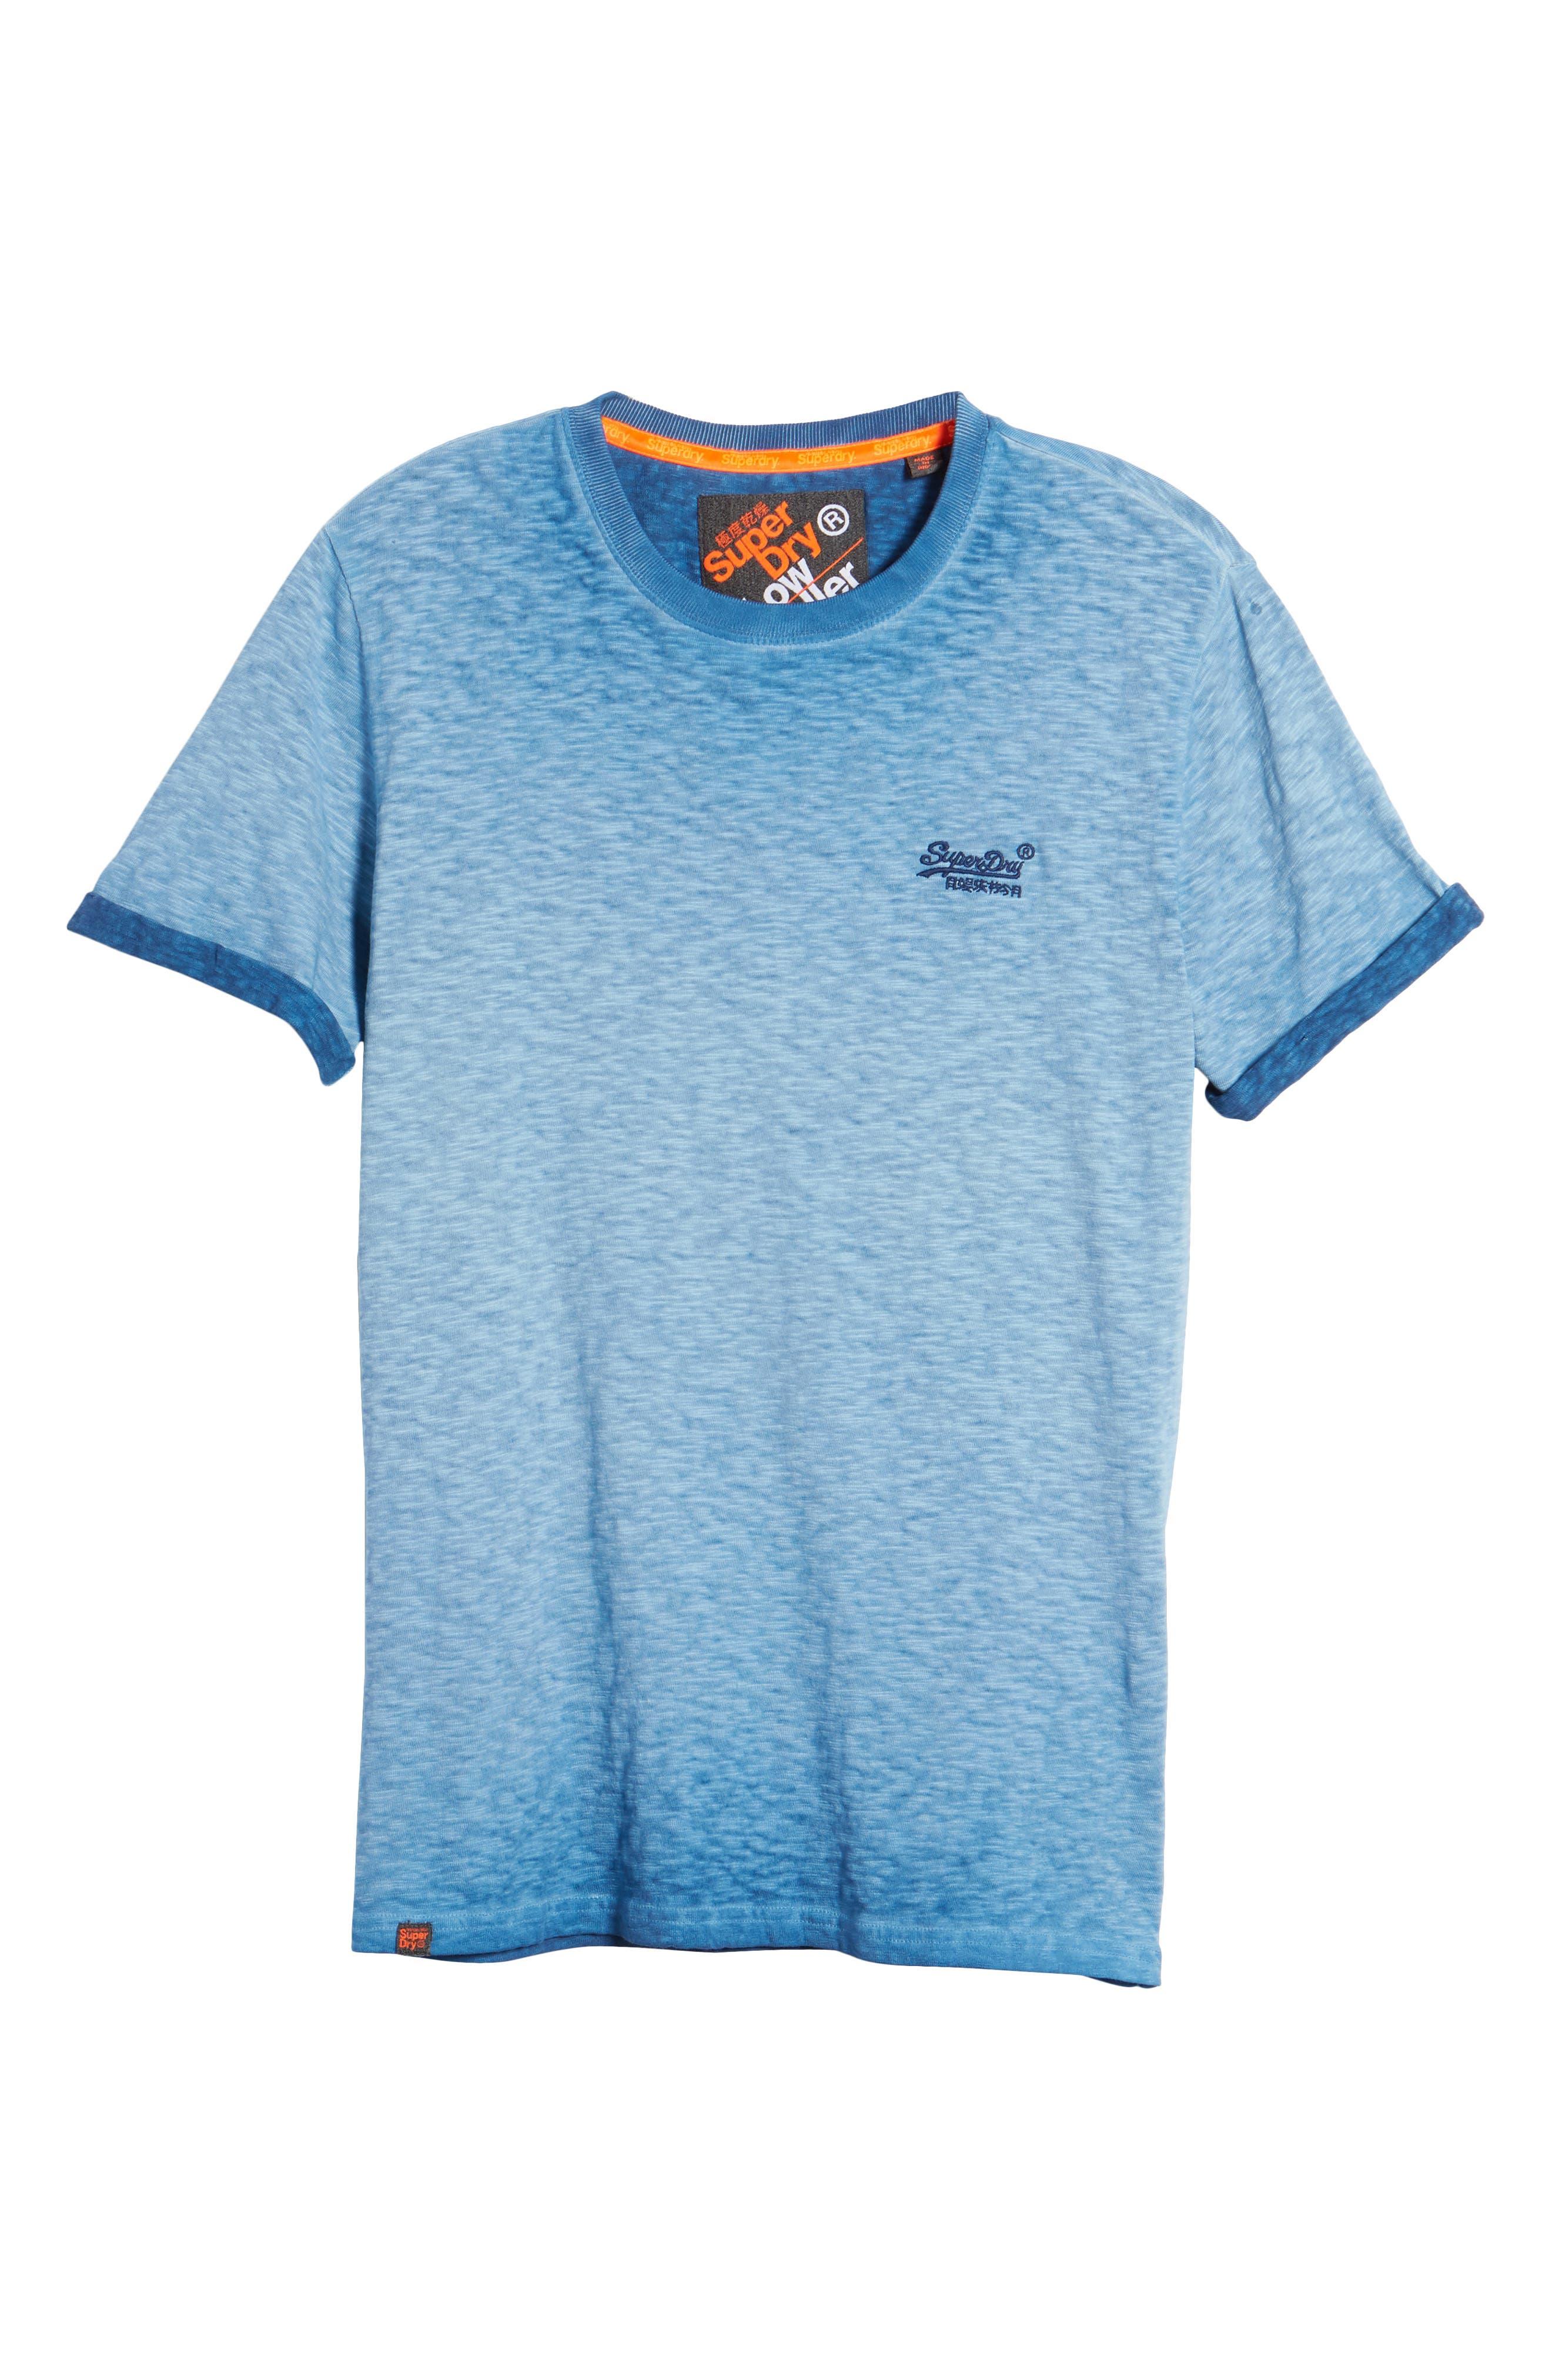 Orange Label Low Roller T-Shirt,                             Alternate thumbnail 26, color,